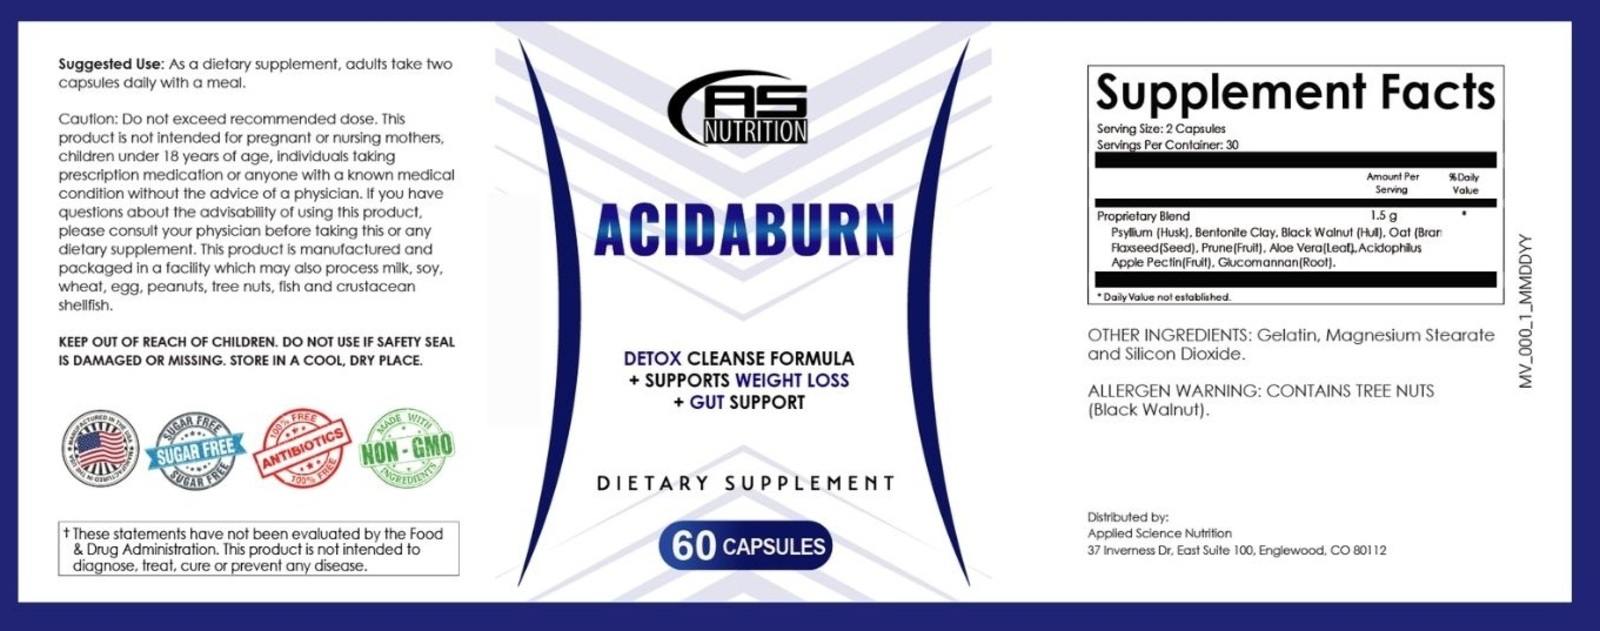 acidaburn ingredients